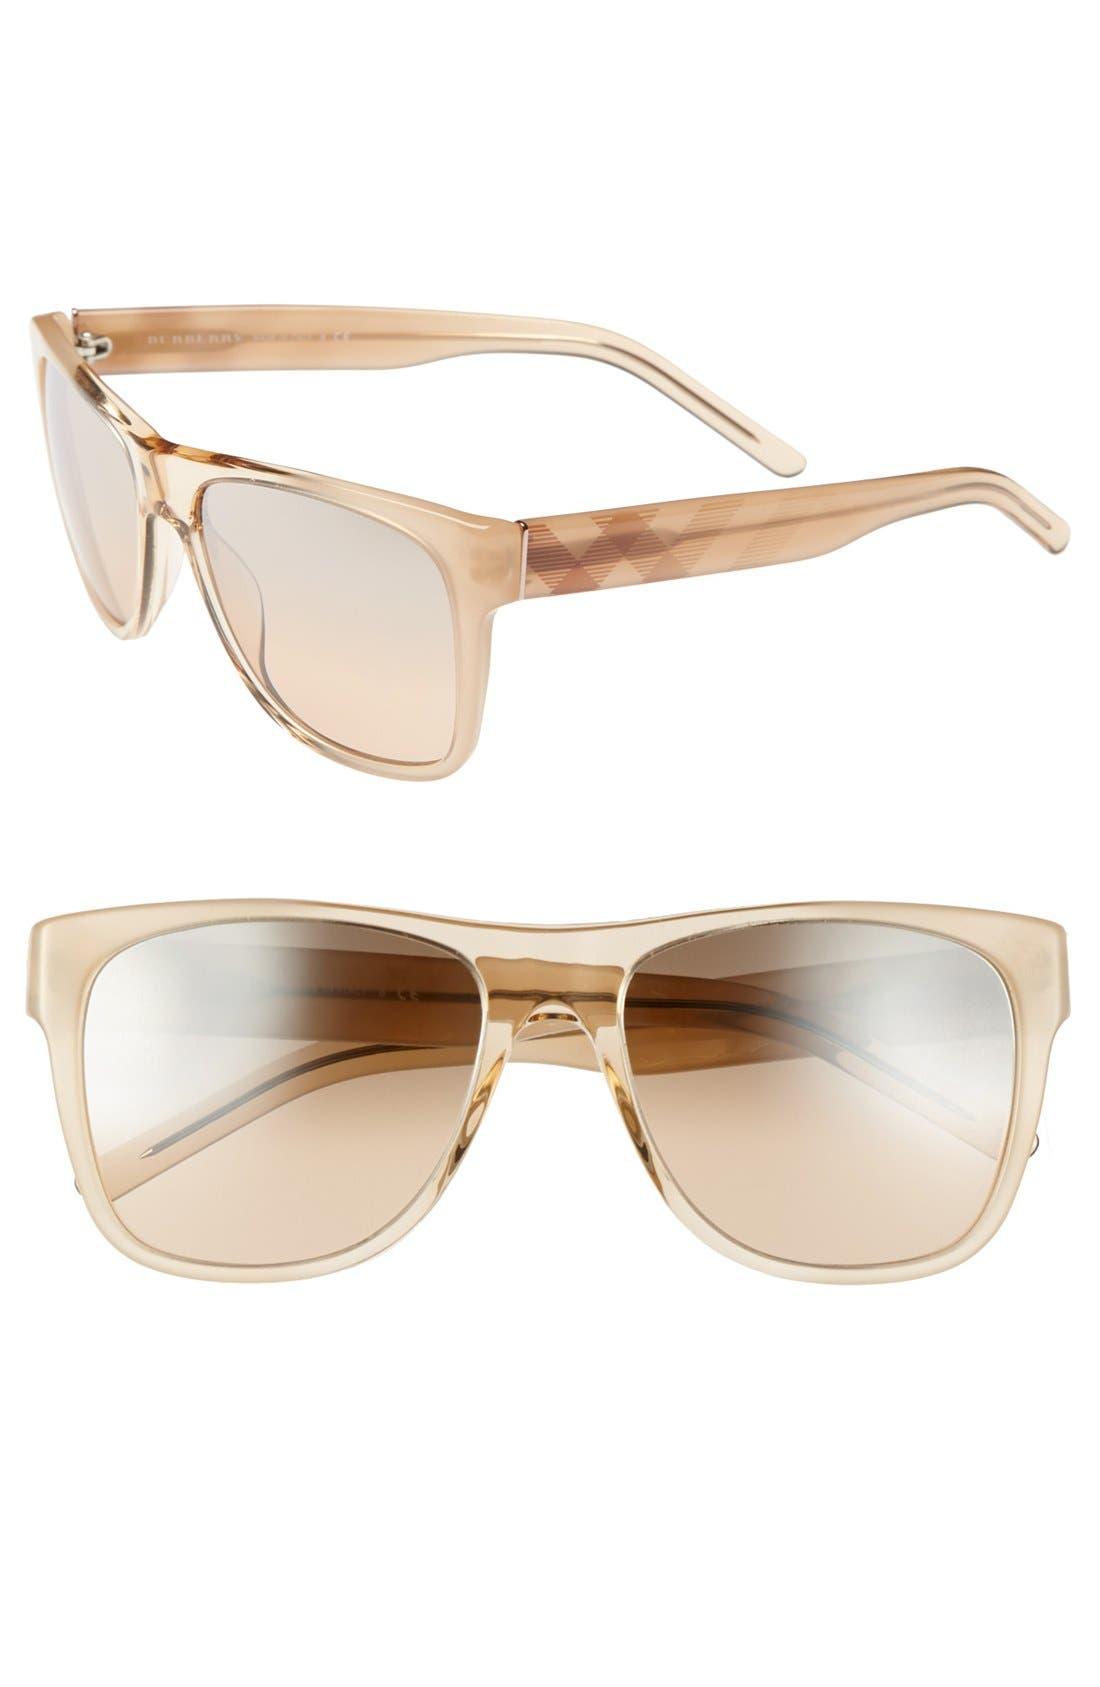 Alternate Image 1 Selected - Burberry 56mm Translucent Sunglasses